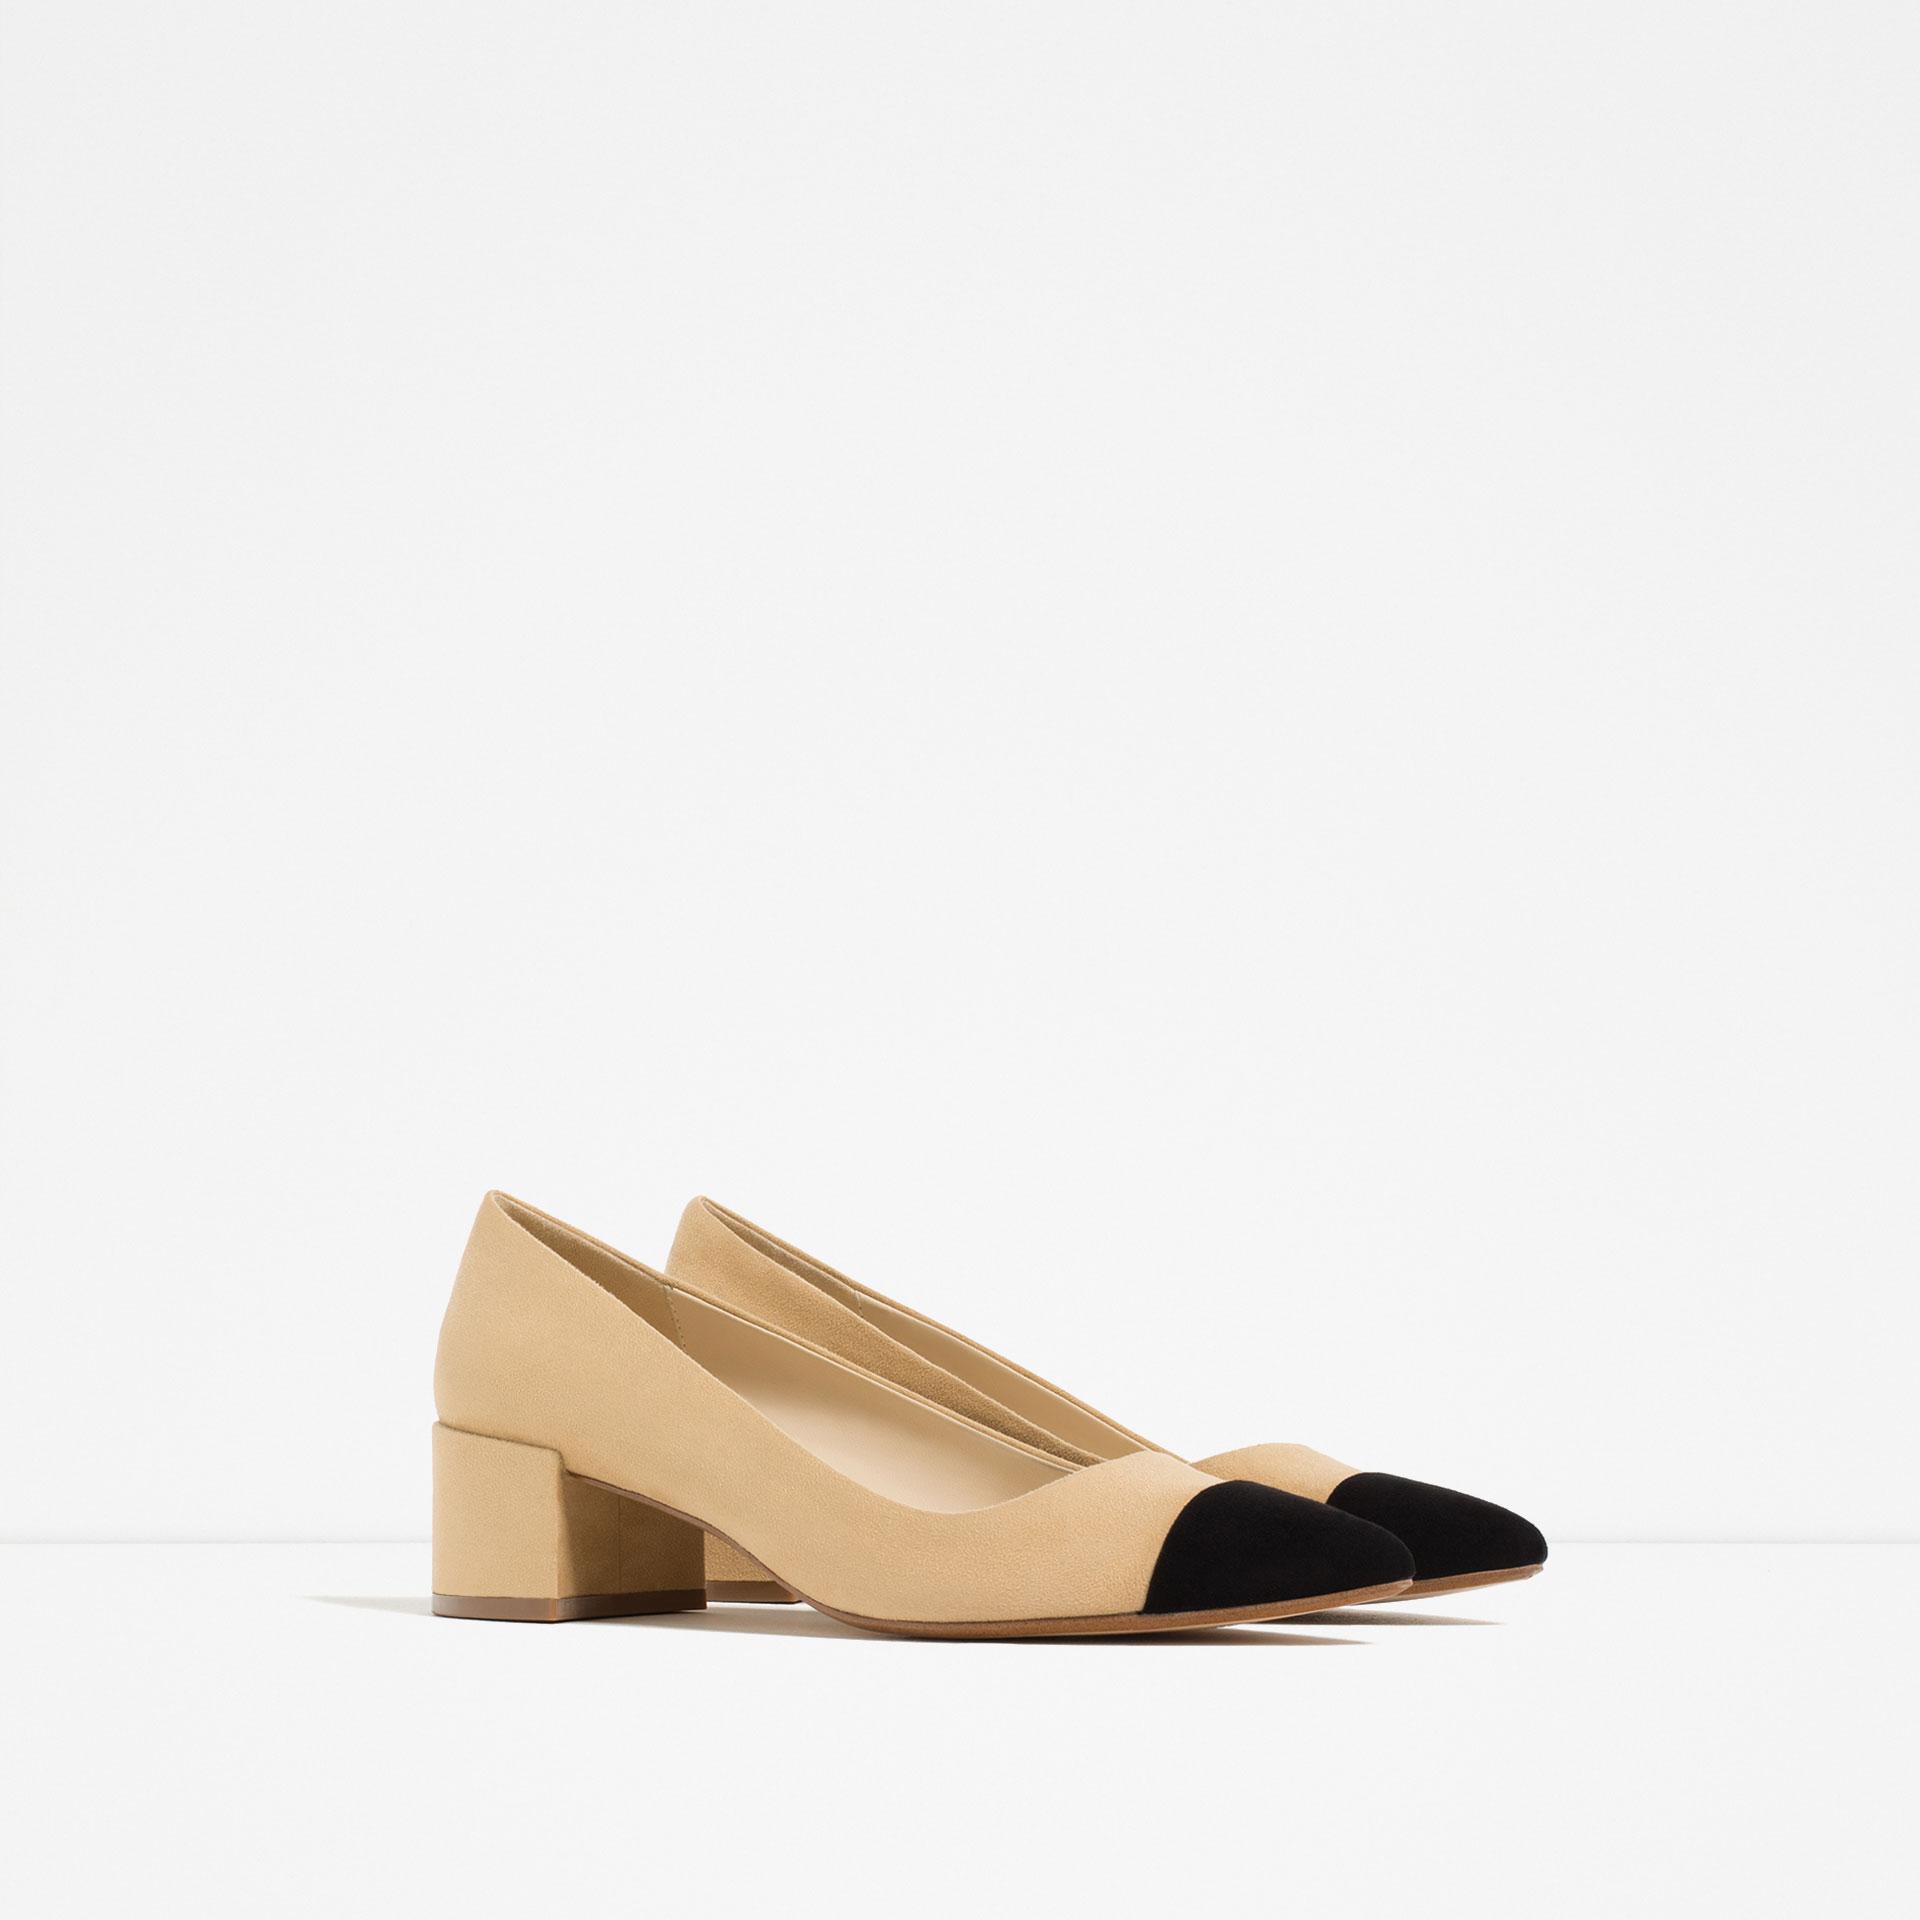 zapatos-bicolor-inspiracion-chanel